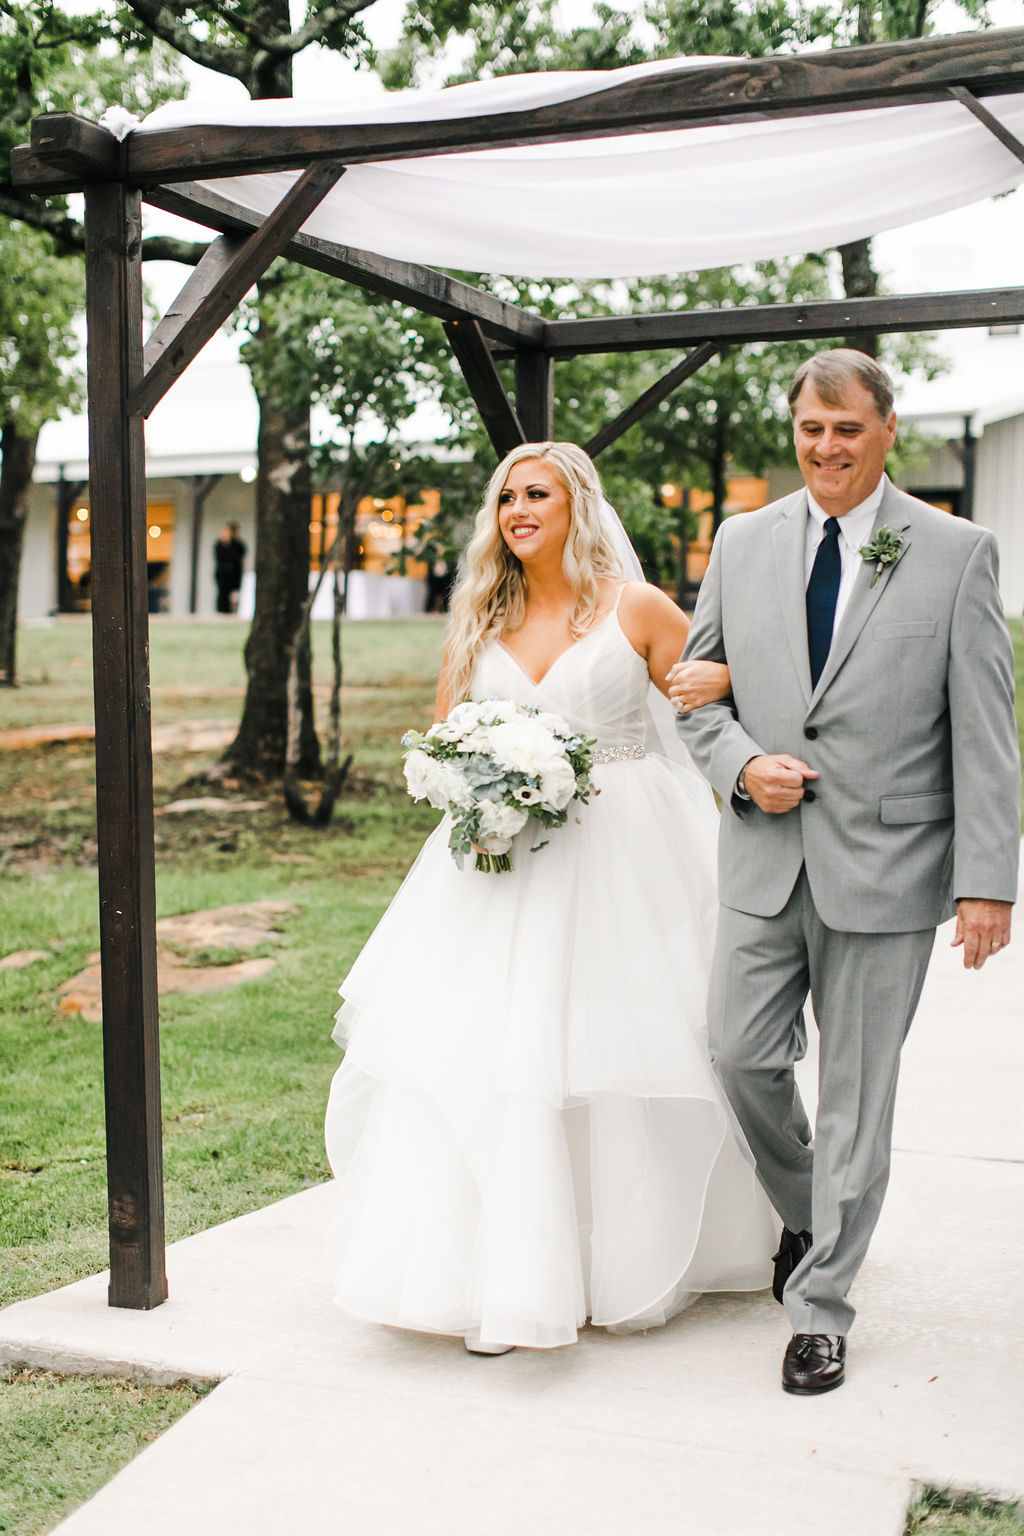 Dream Point Ranch Tulsa's White Barn Wedding Venue 69.jpg